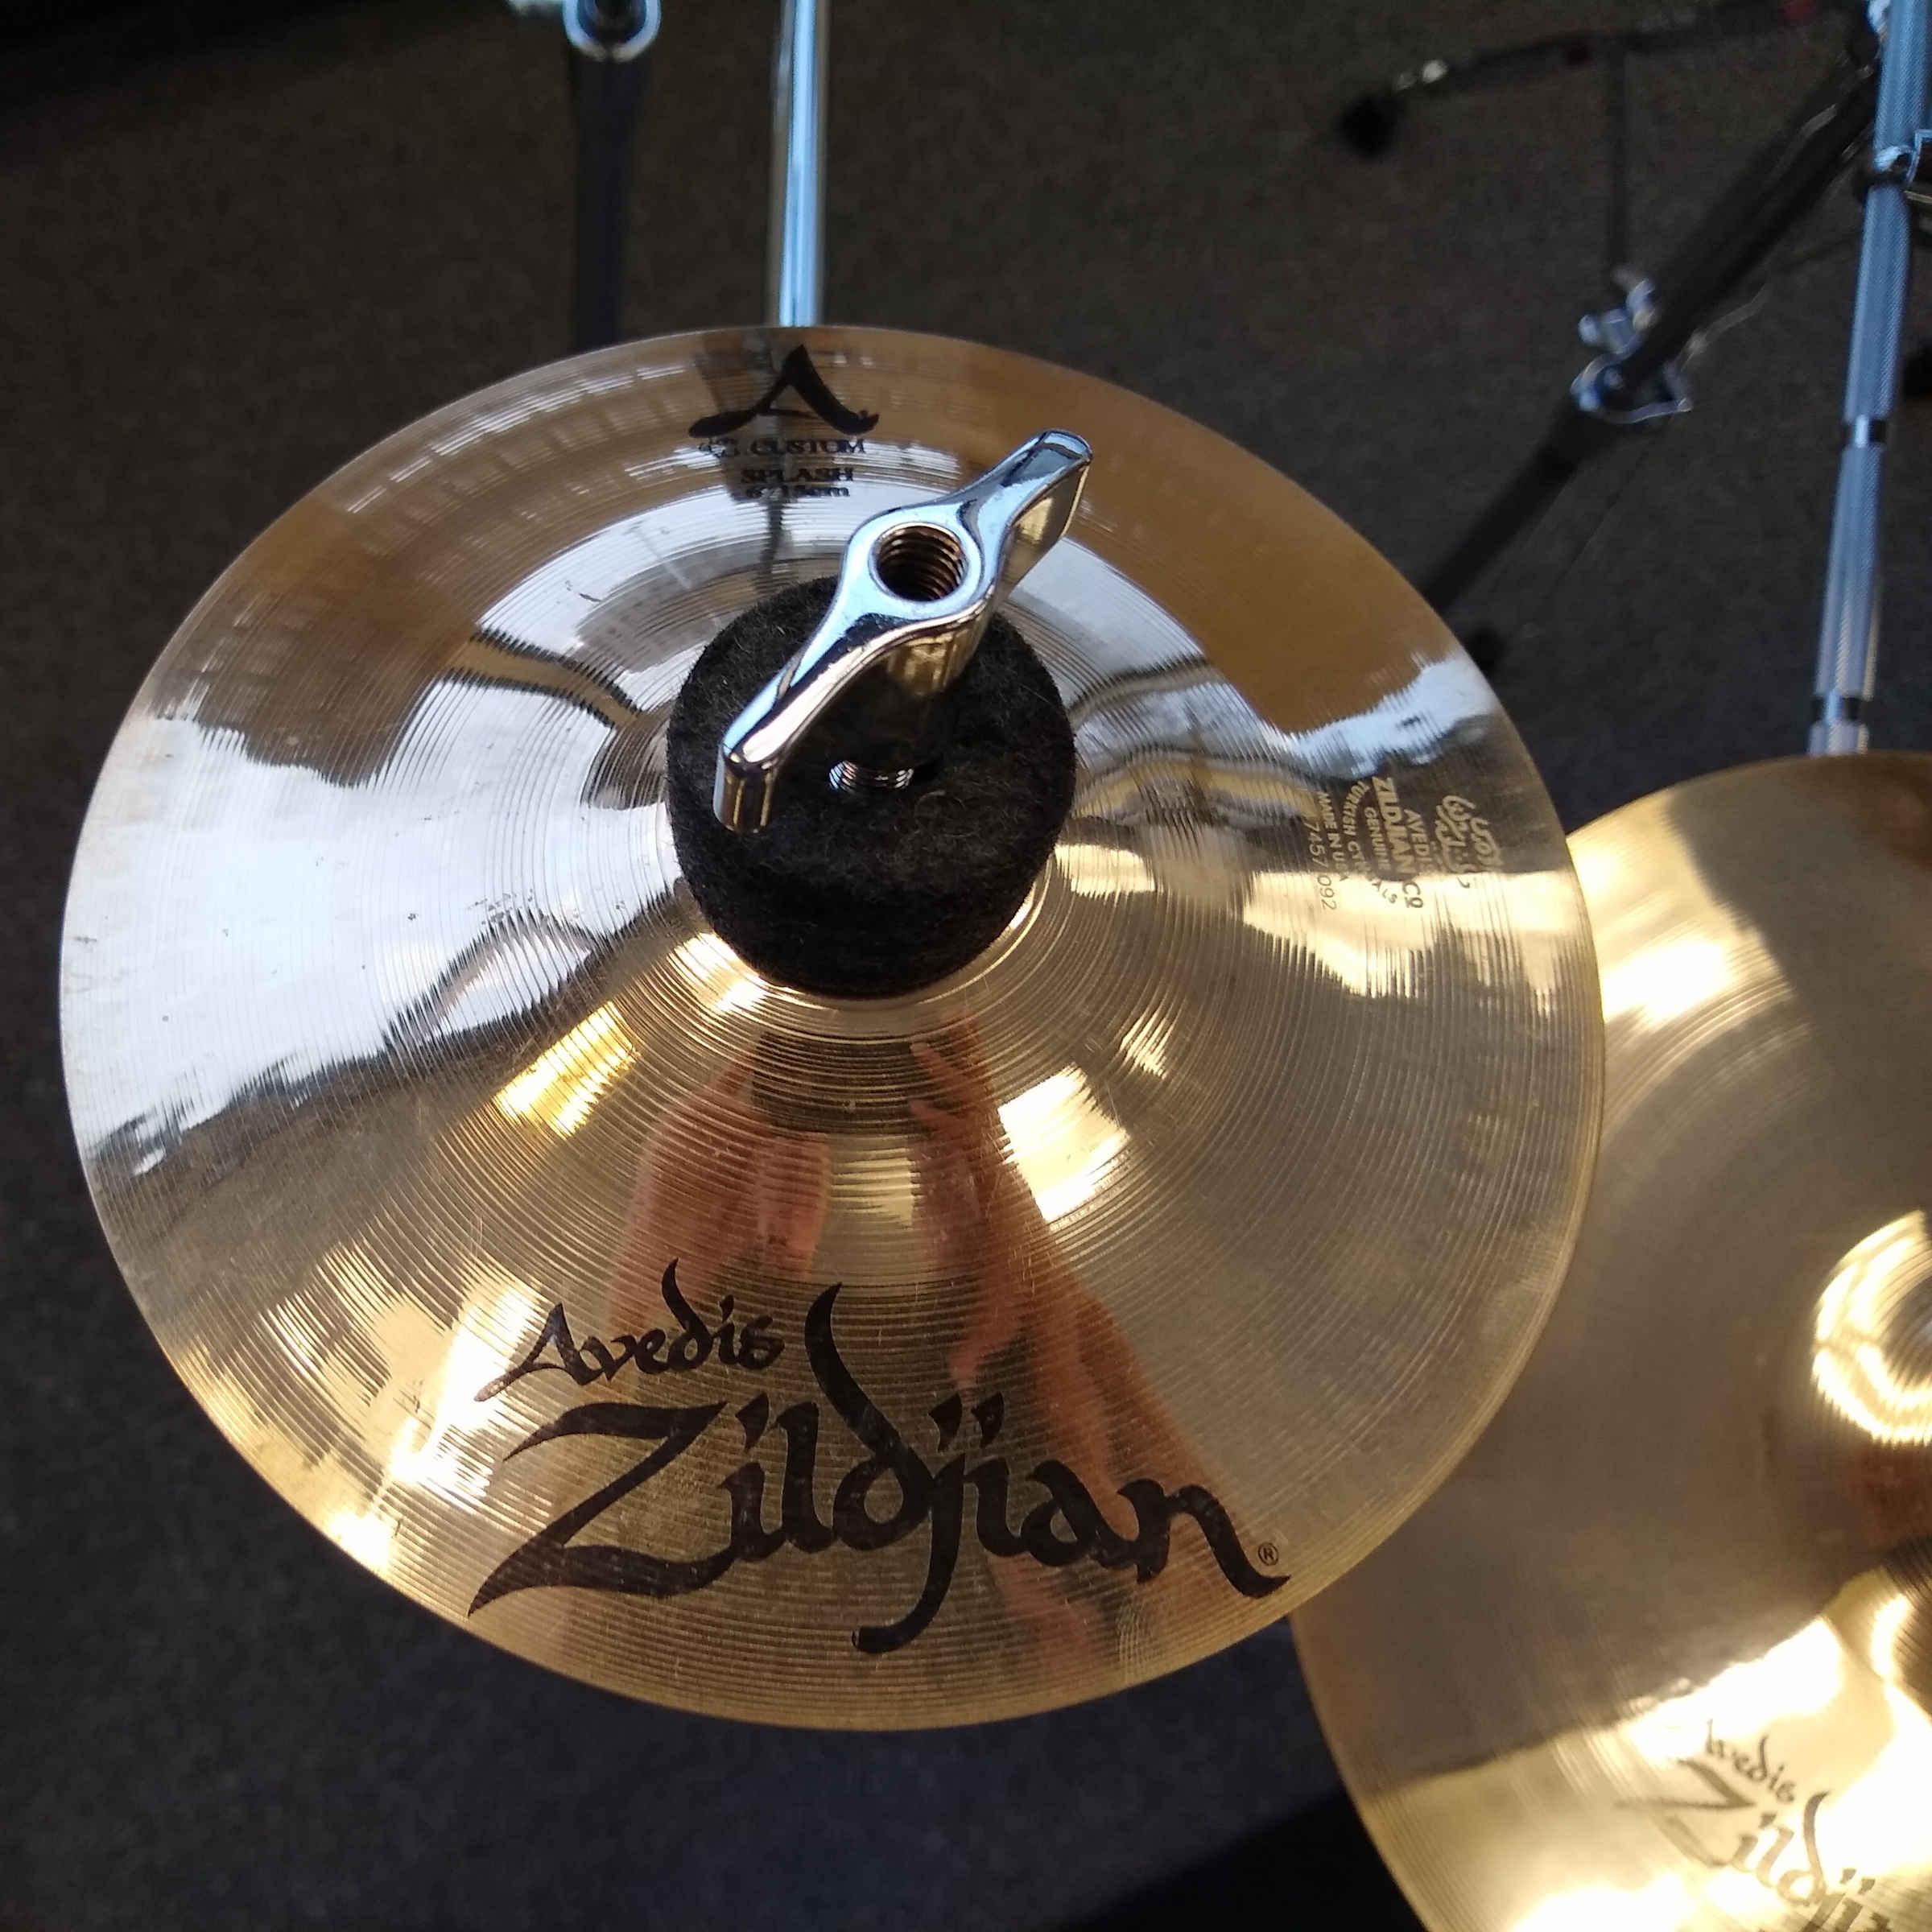 Zildjian Avedis Custom 6